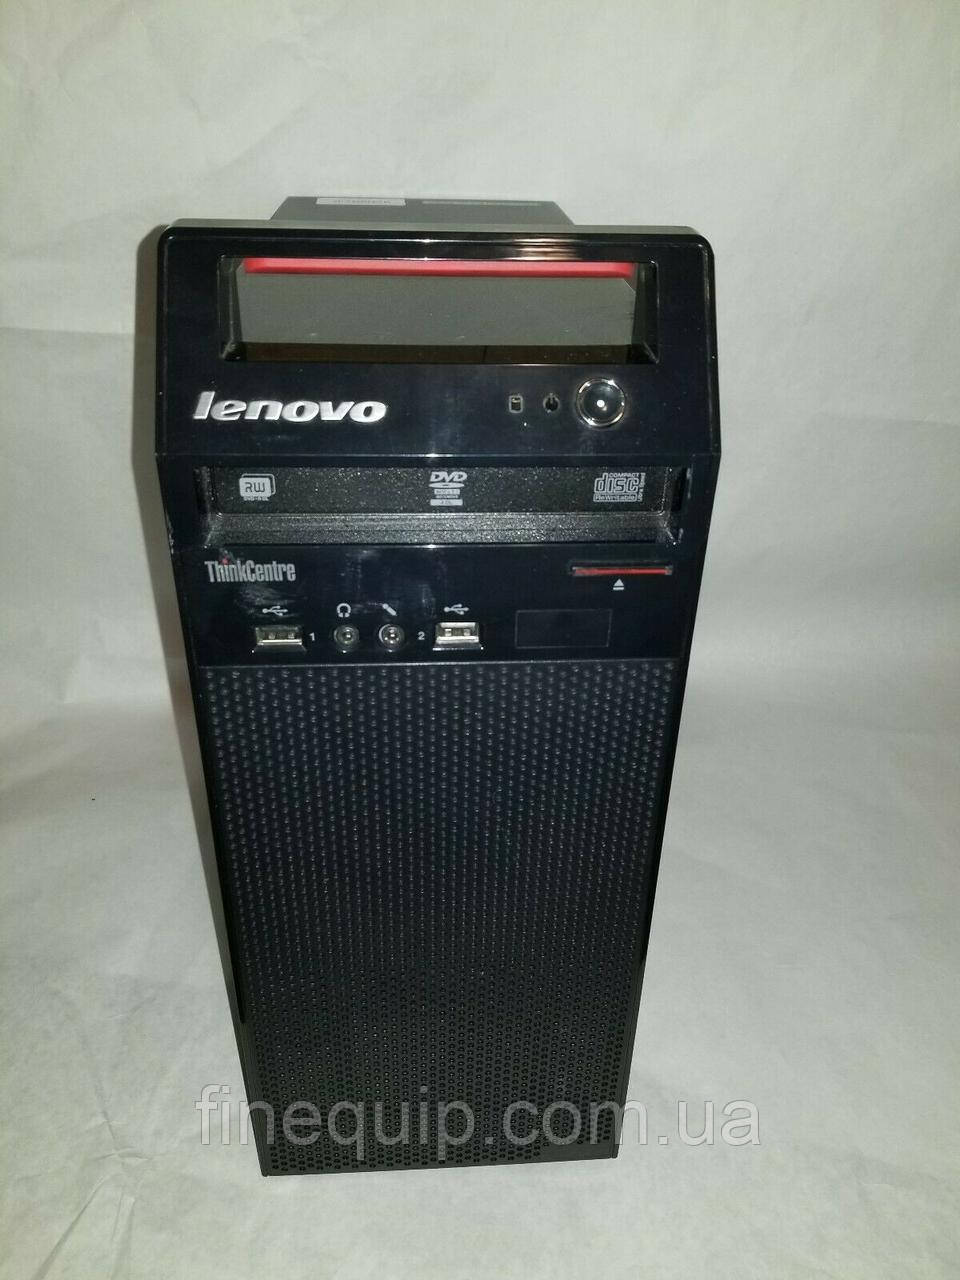 Системний блок Lenovo ThinkCentre E73-Mini-Tower-Intel Pentium G3240-3,1GHz-4Gb-DDR3-HDD-500GB-DVD-RW- Б/В